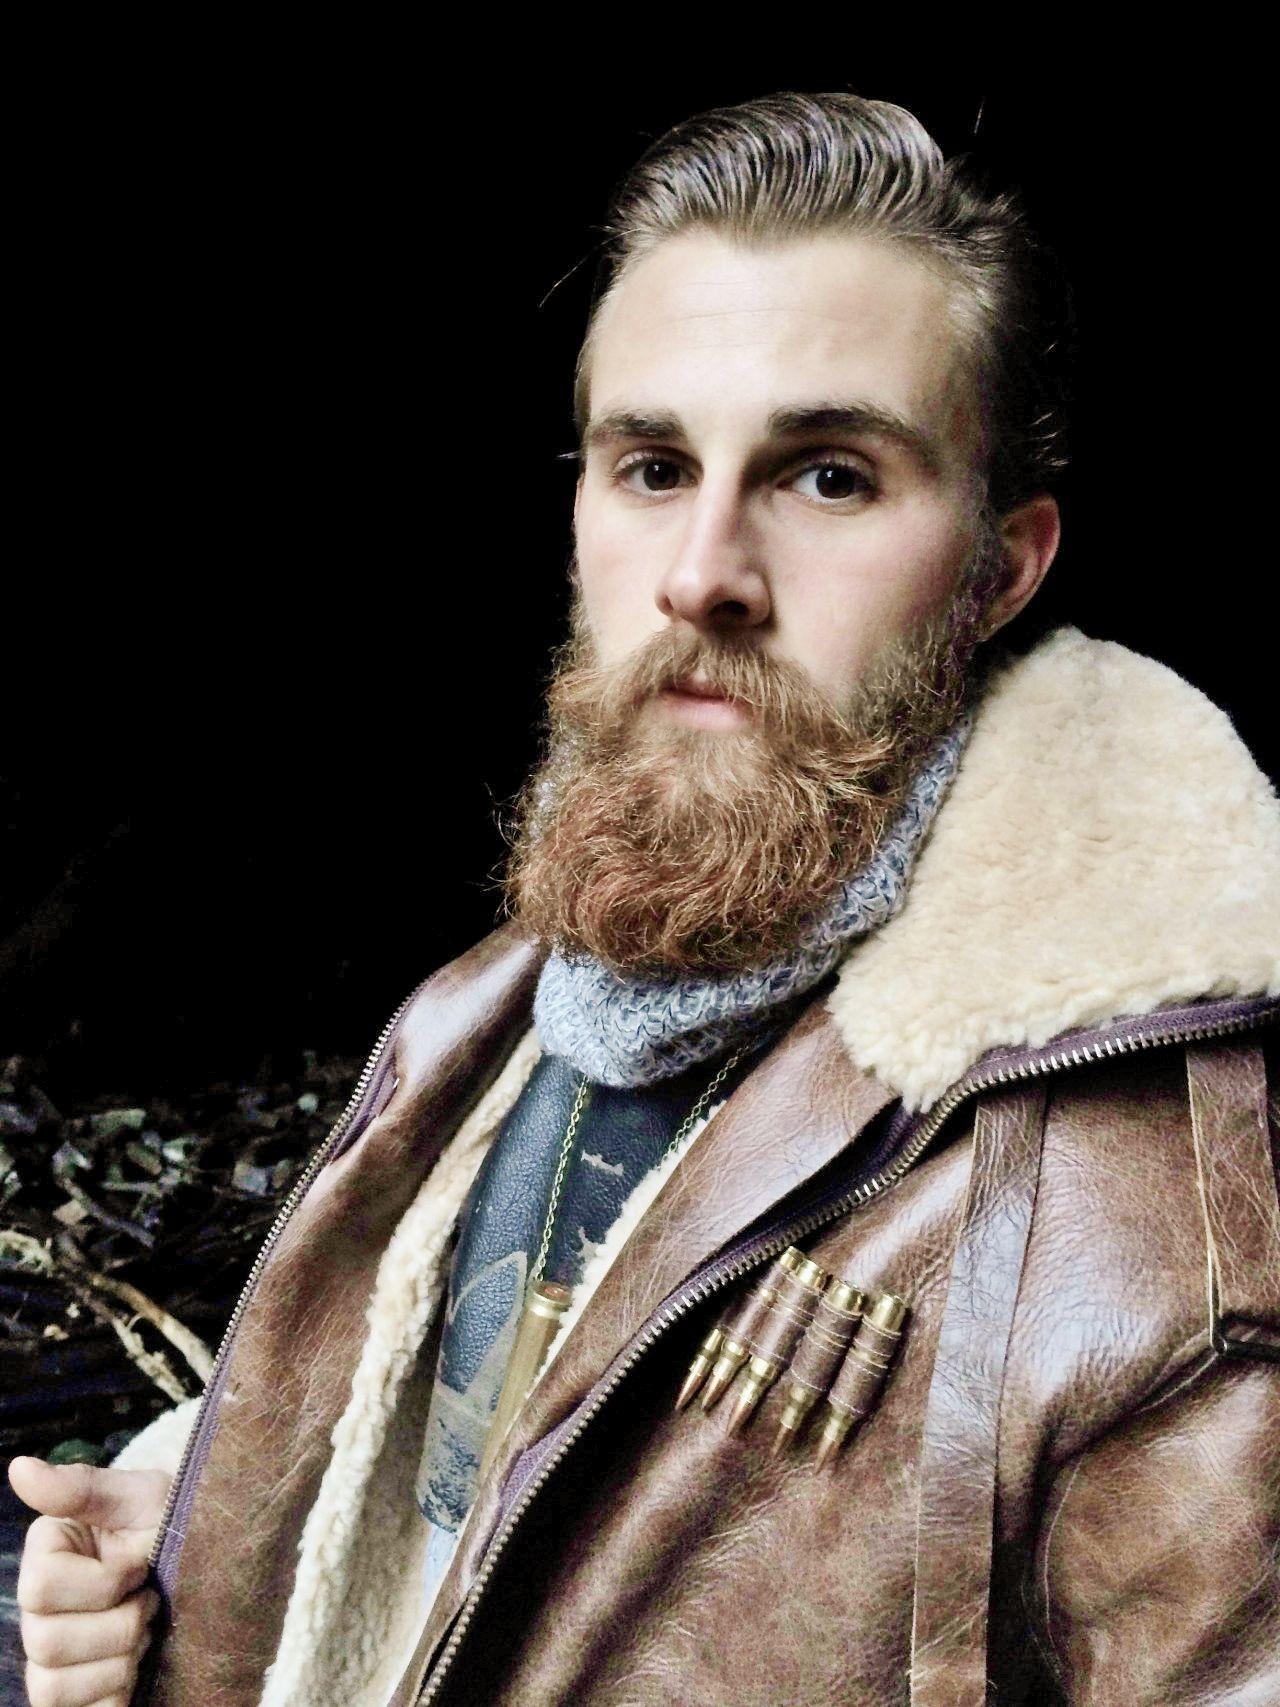 Beards image by Mark M Billboard artists, Post malone